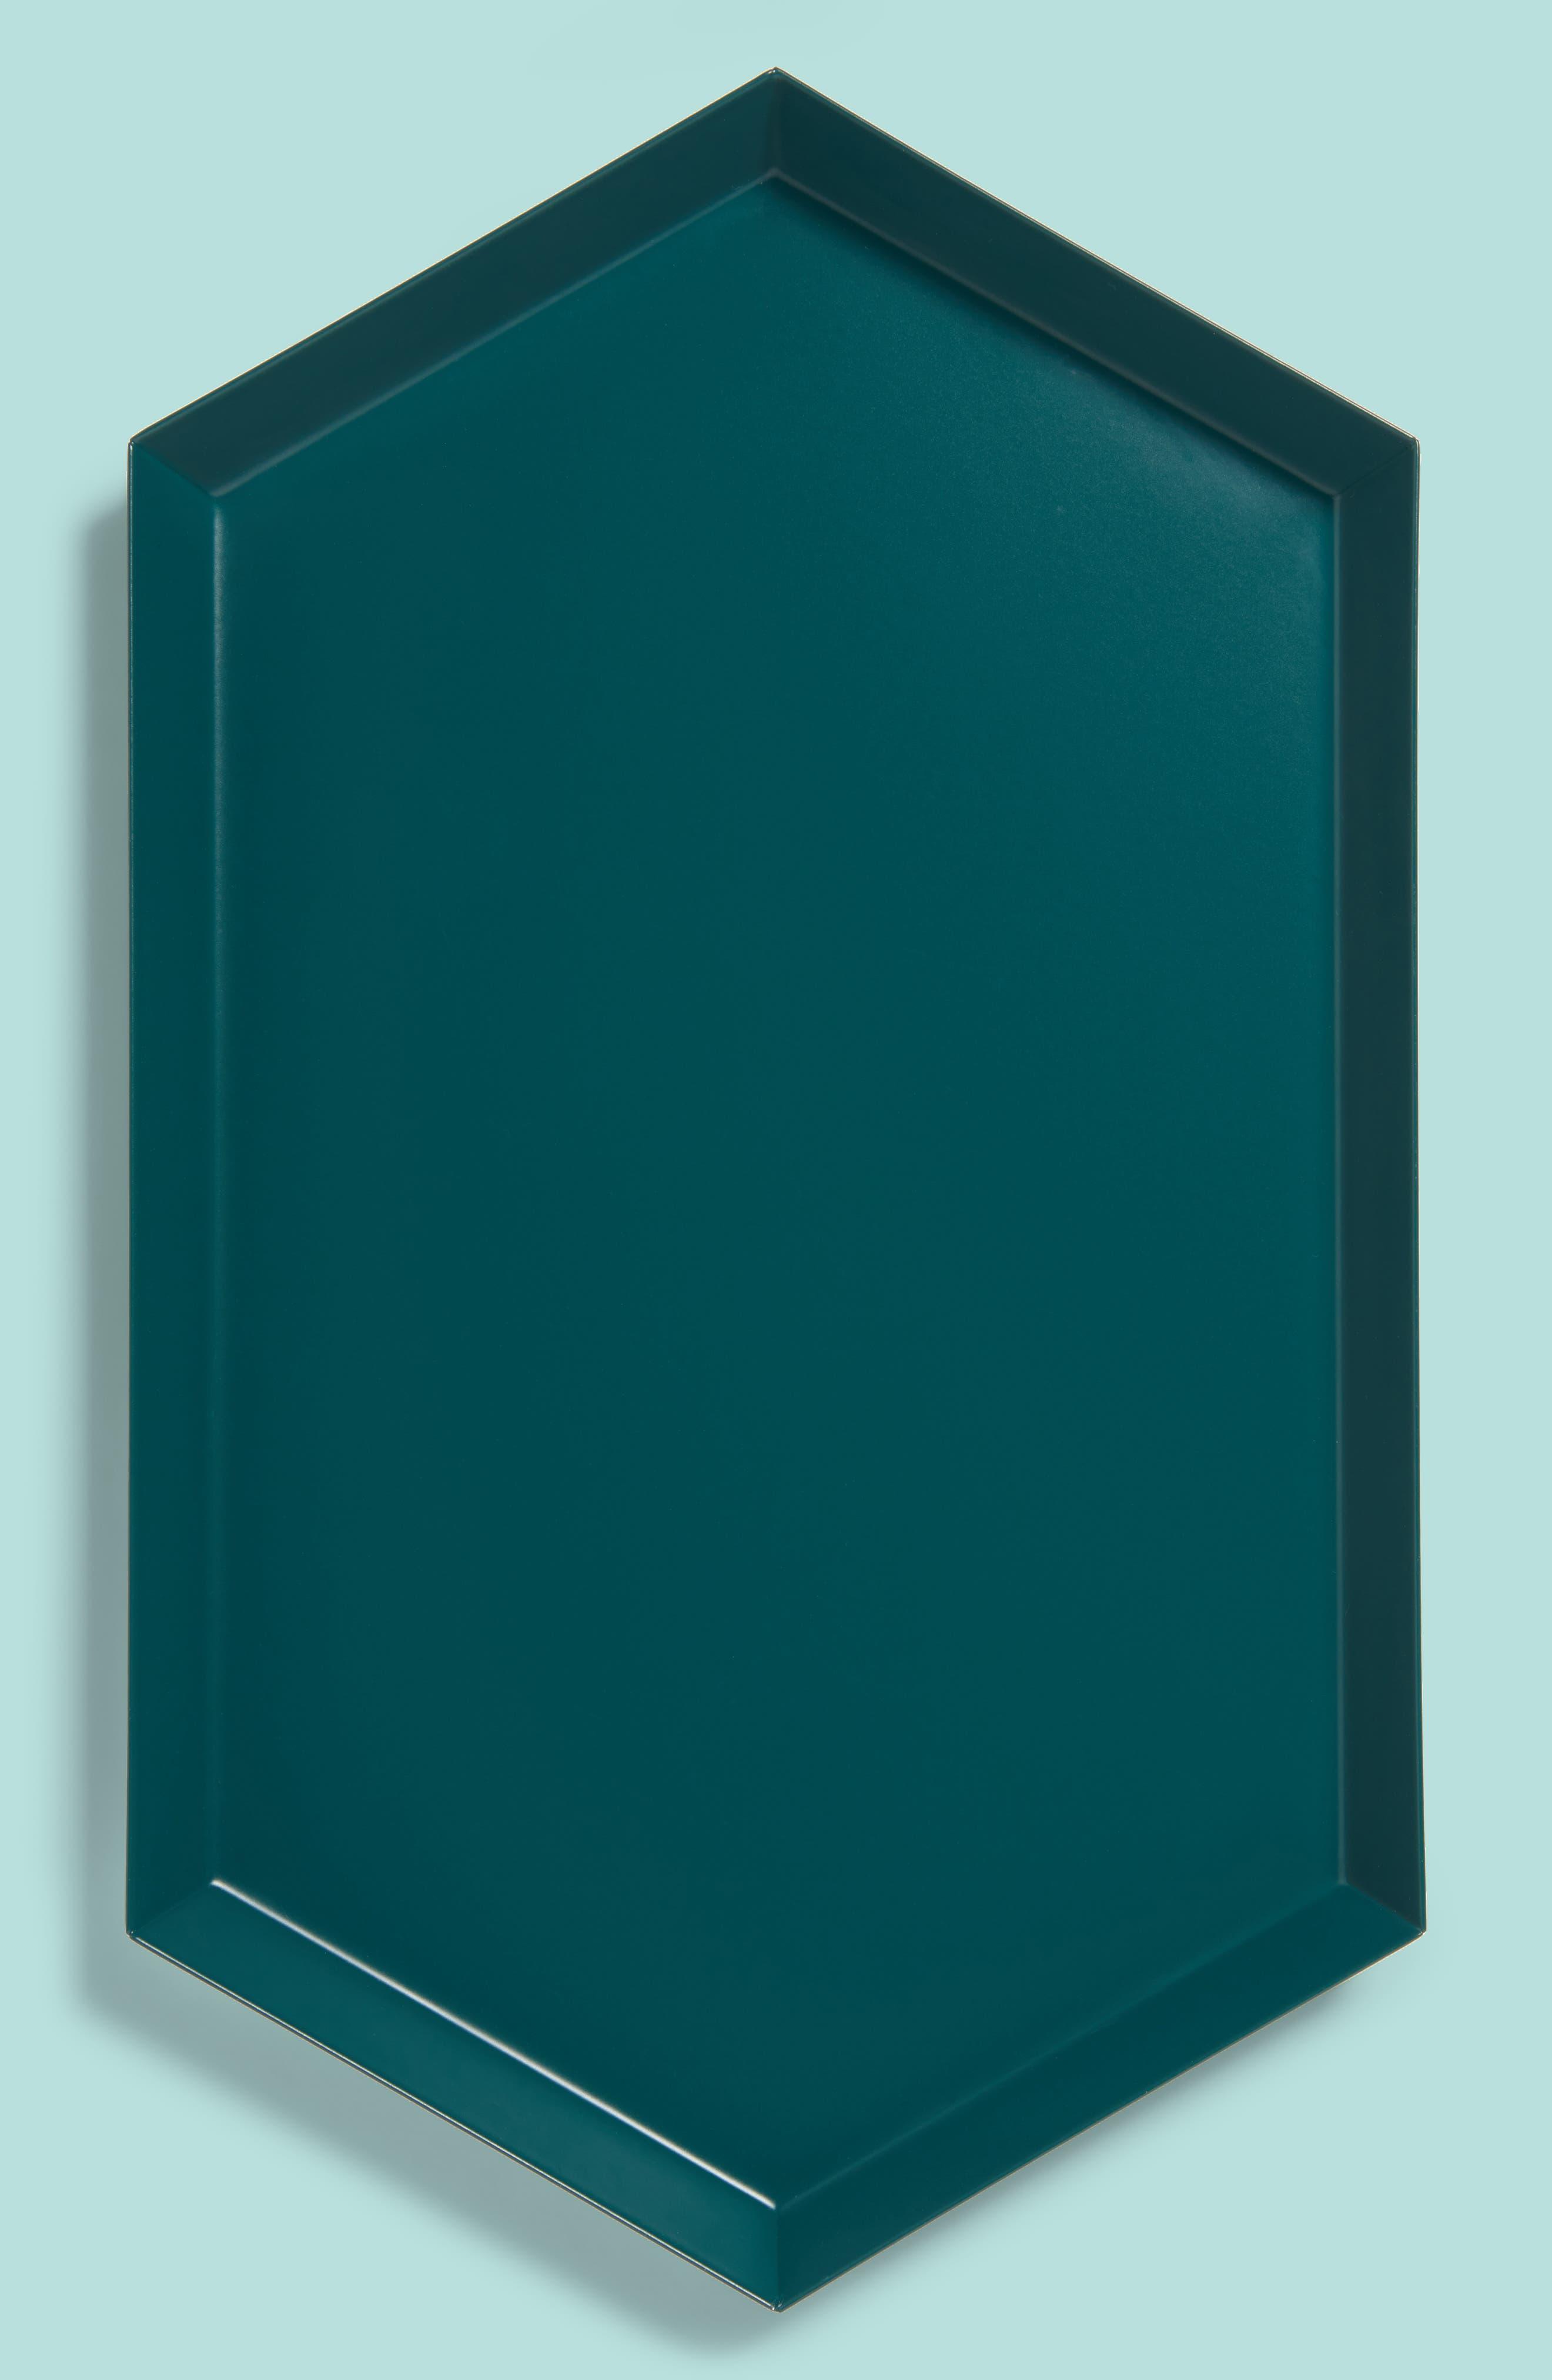 Medium Kaleido Powder Coated Steel Tray,                         Main,                         color, Dark Green